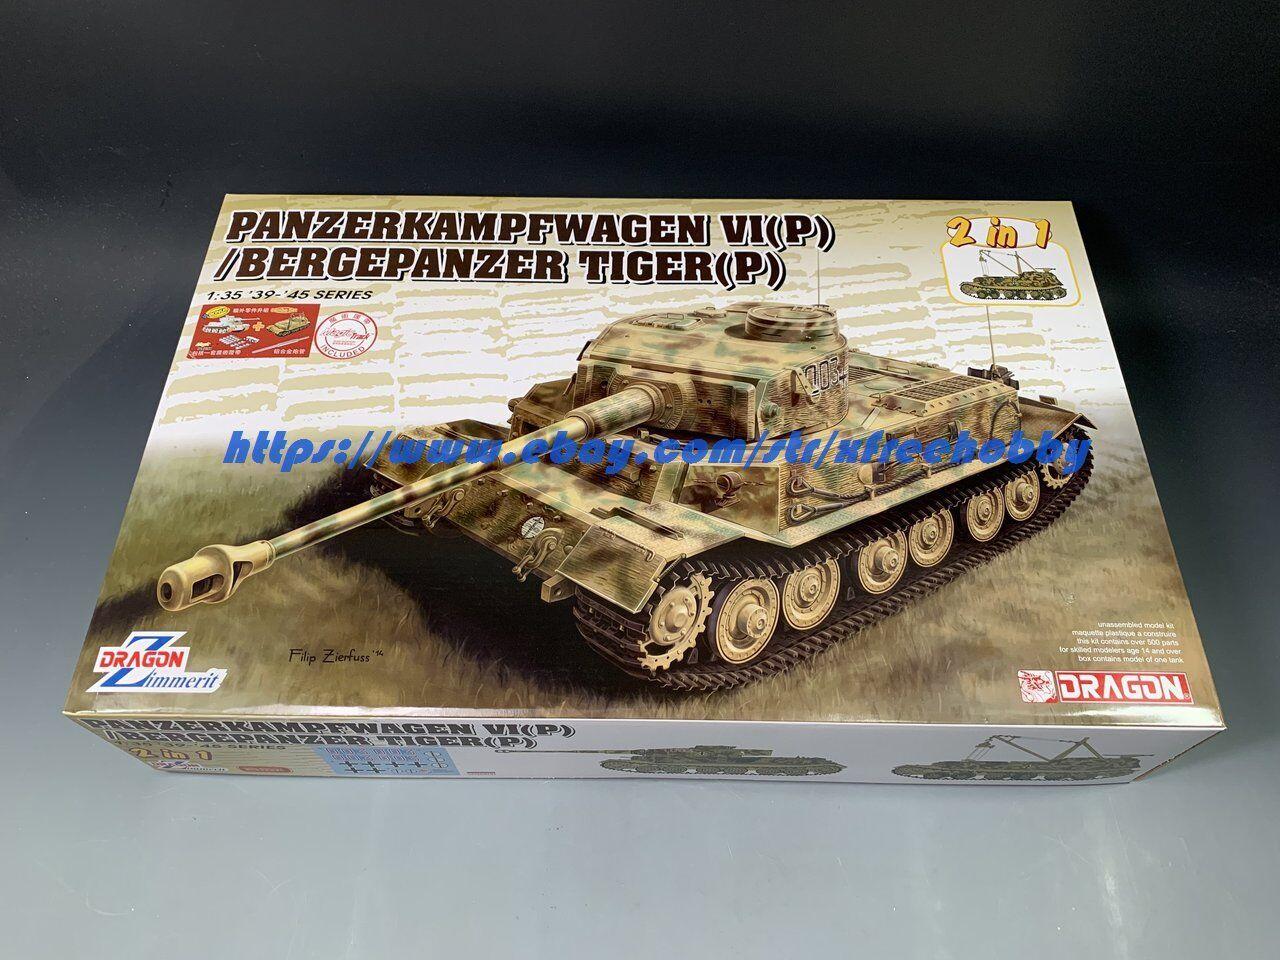 DRAGON 6869 1 35 Panzerkampfwagen VI(P) & Bergepanzer Tiger (P)